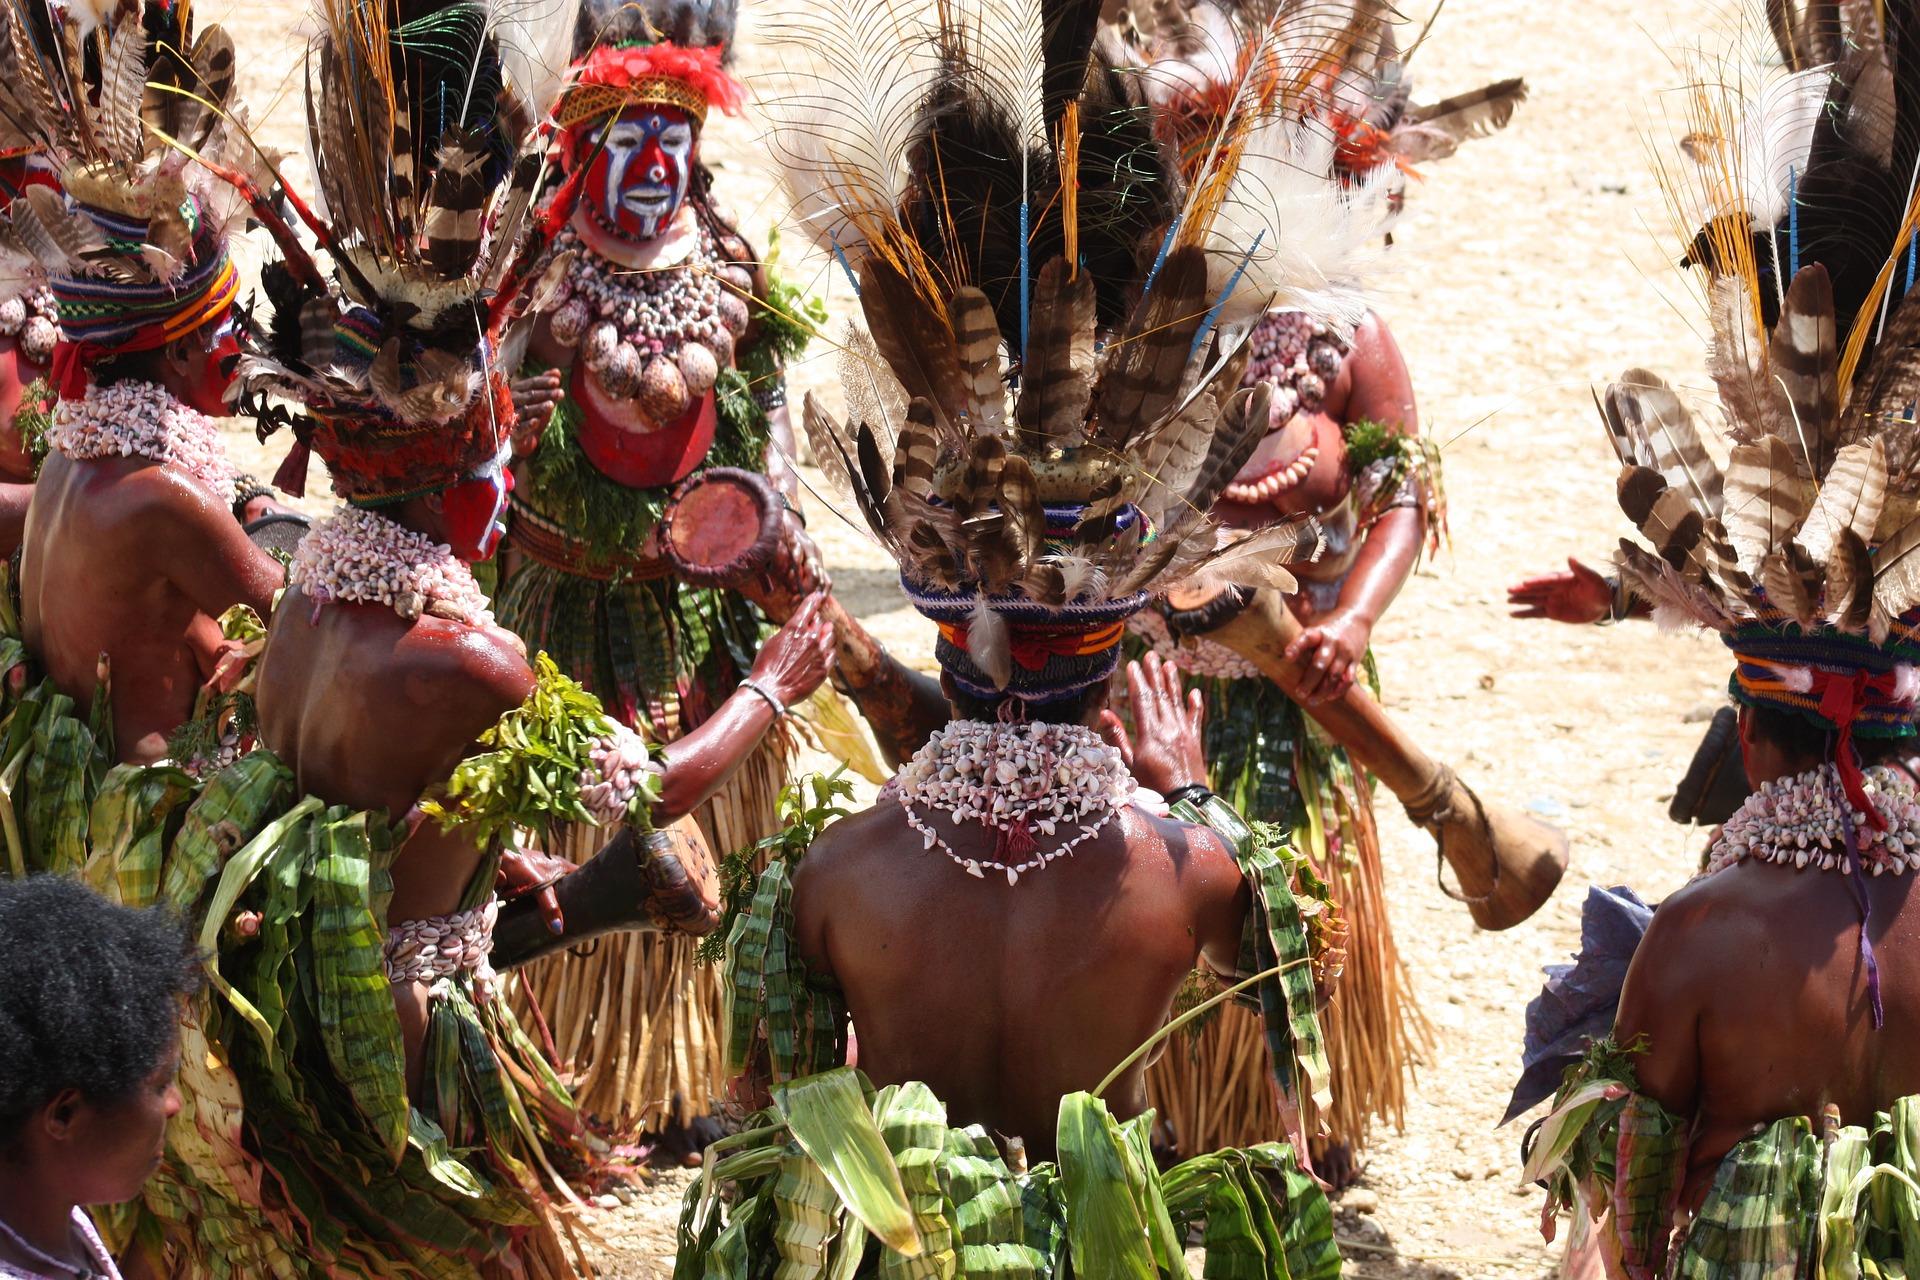 Sing Sing Papua New Guinea